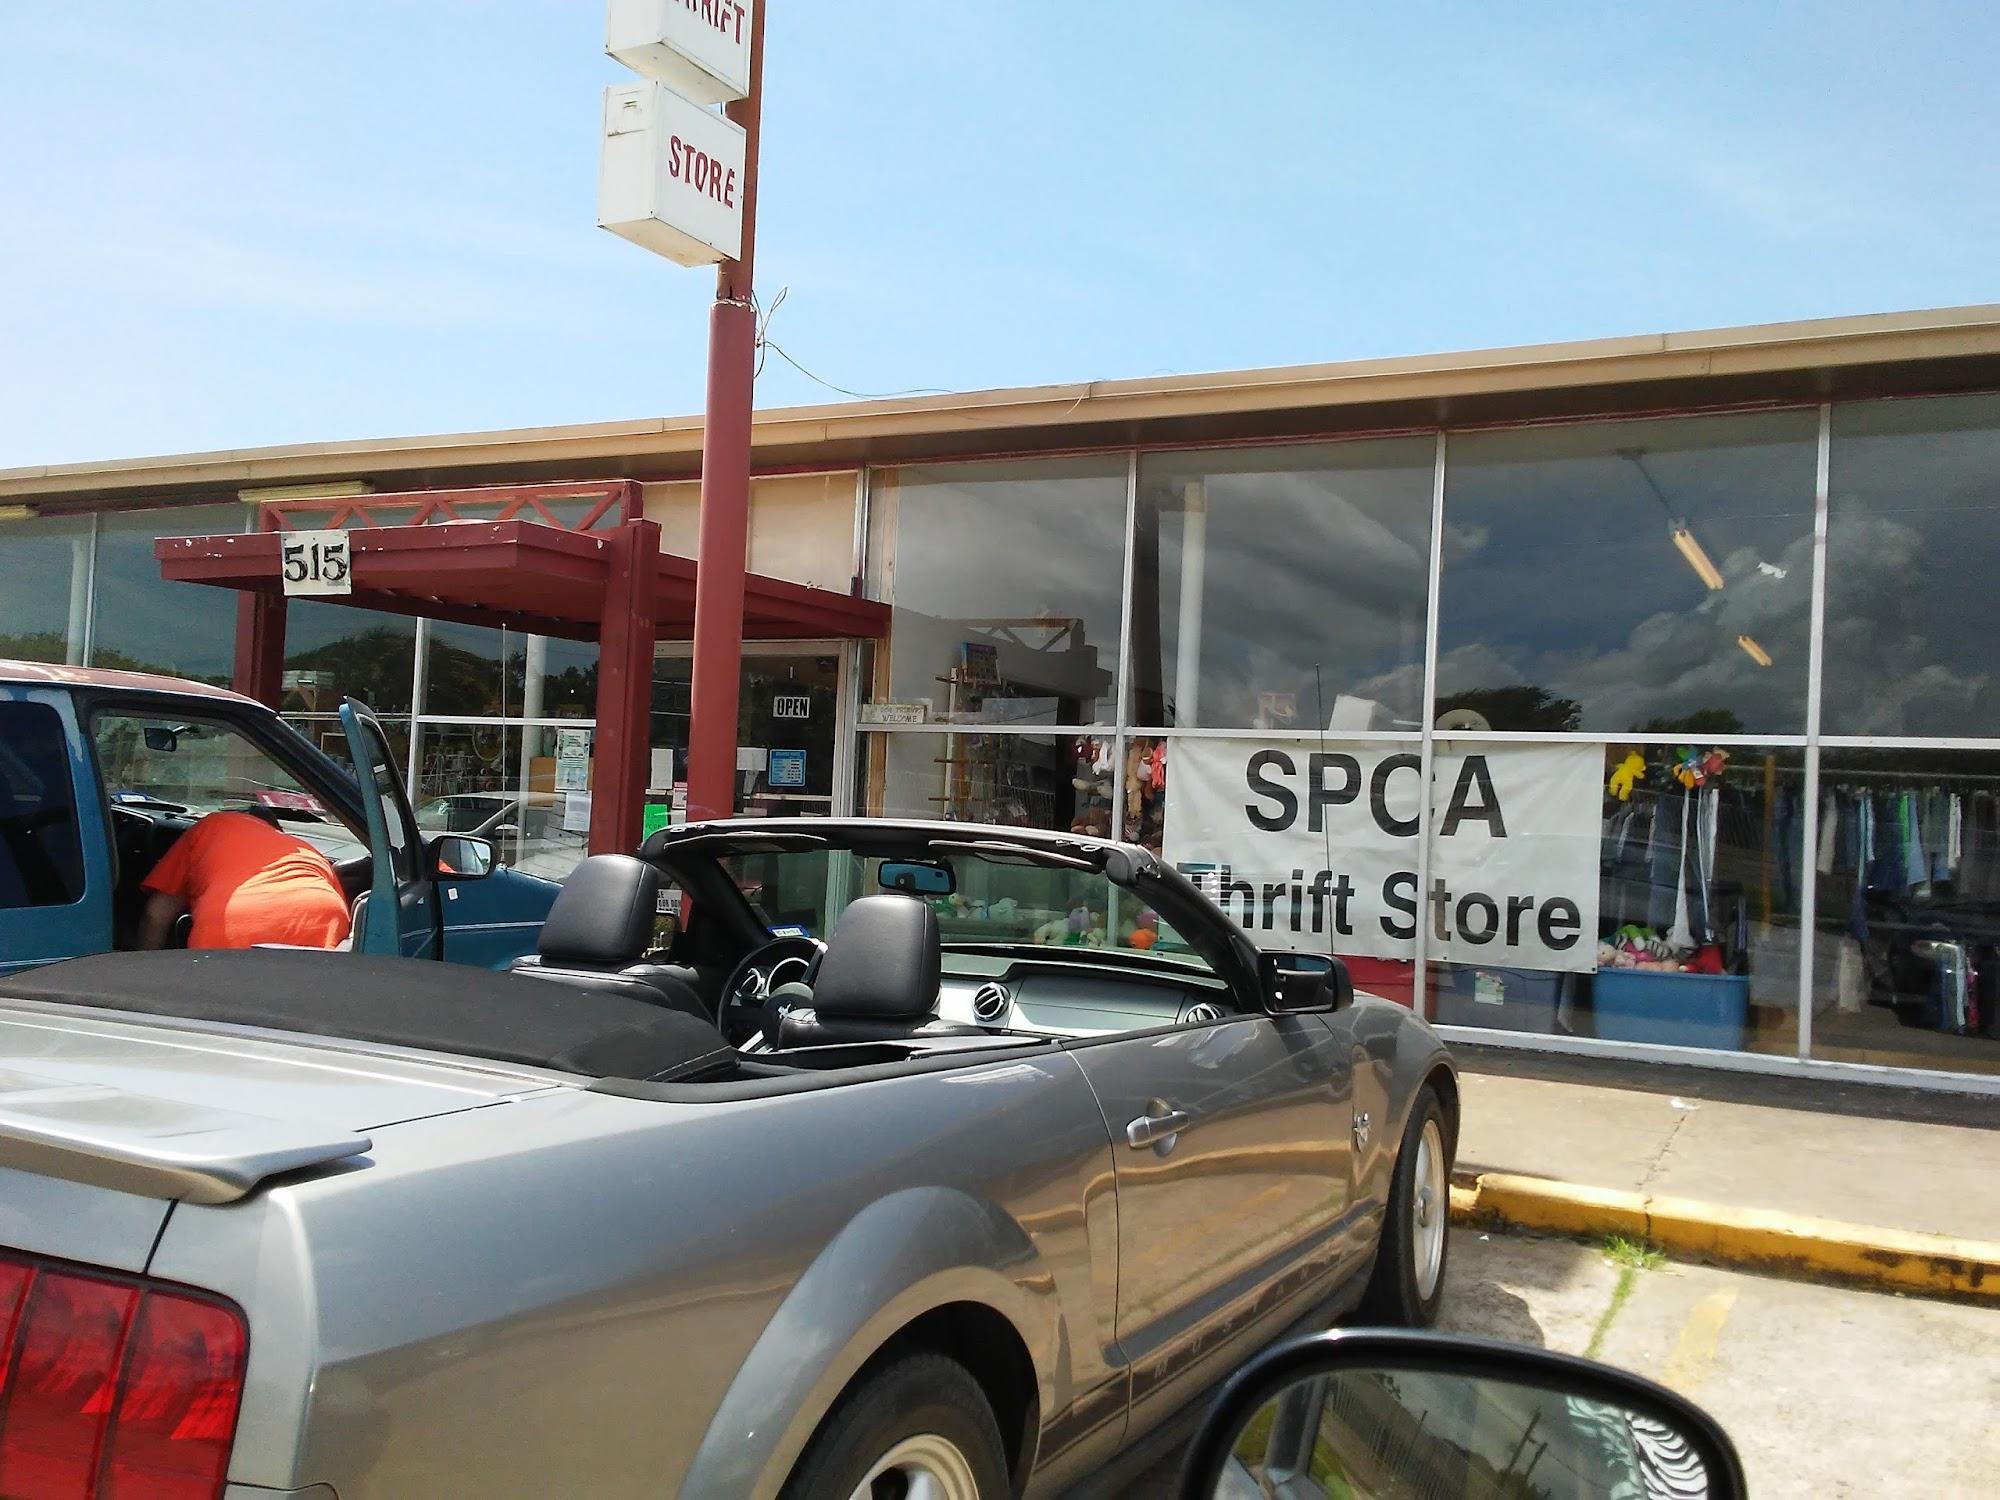 SPCA Thrift Shop 515 W 2nd St, Freeport